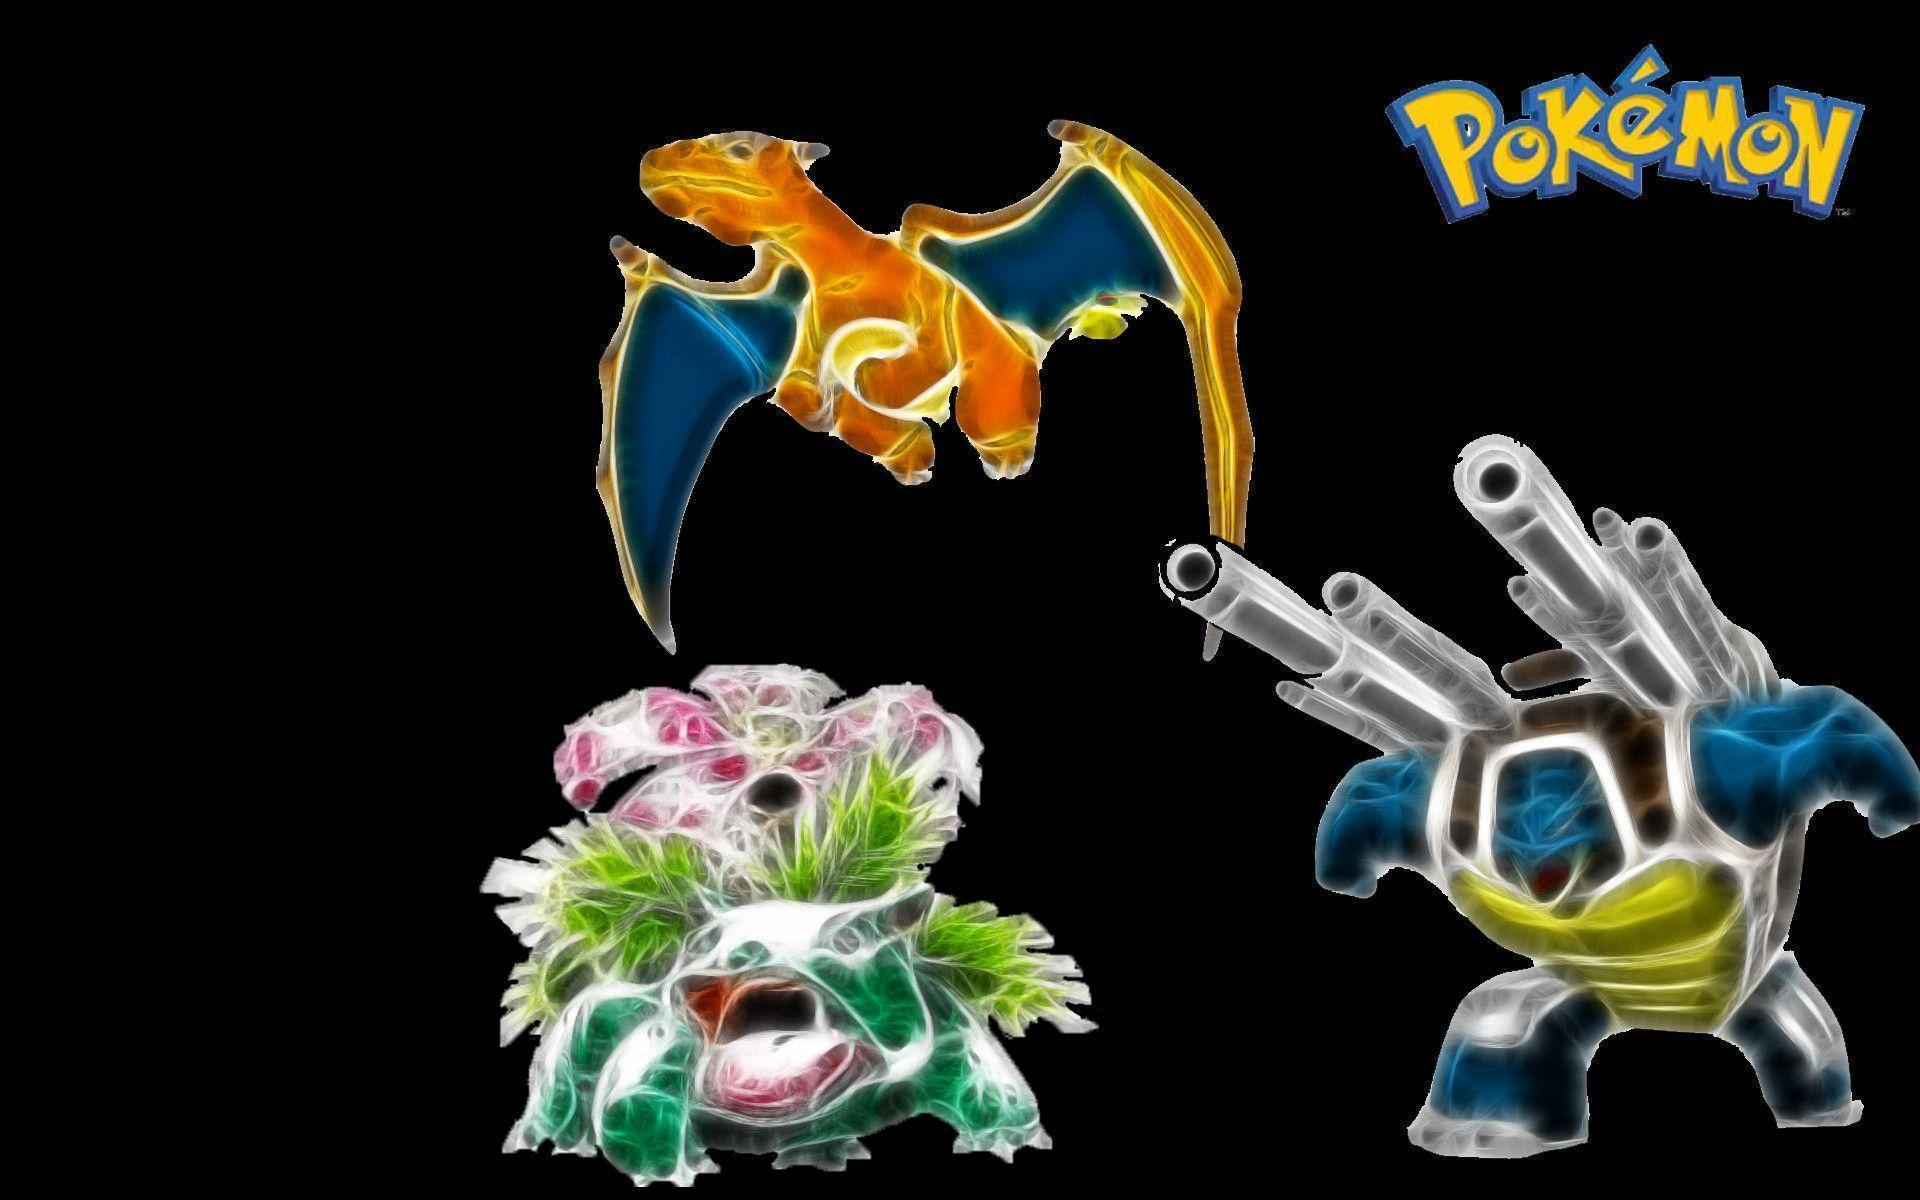 Pokemon Wallpapers Charizard - Wallpaper Cave